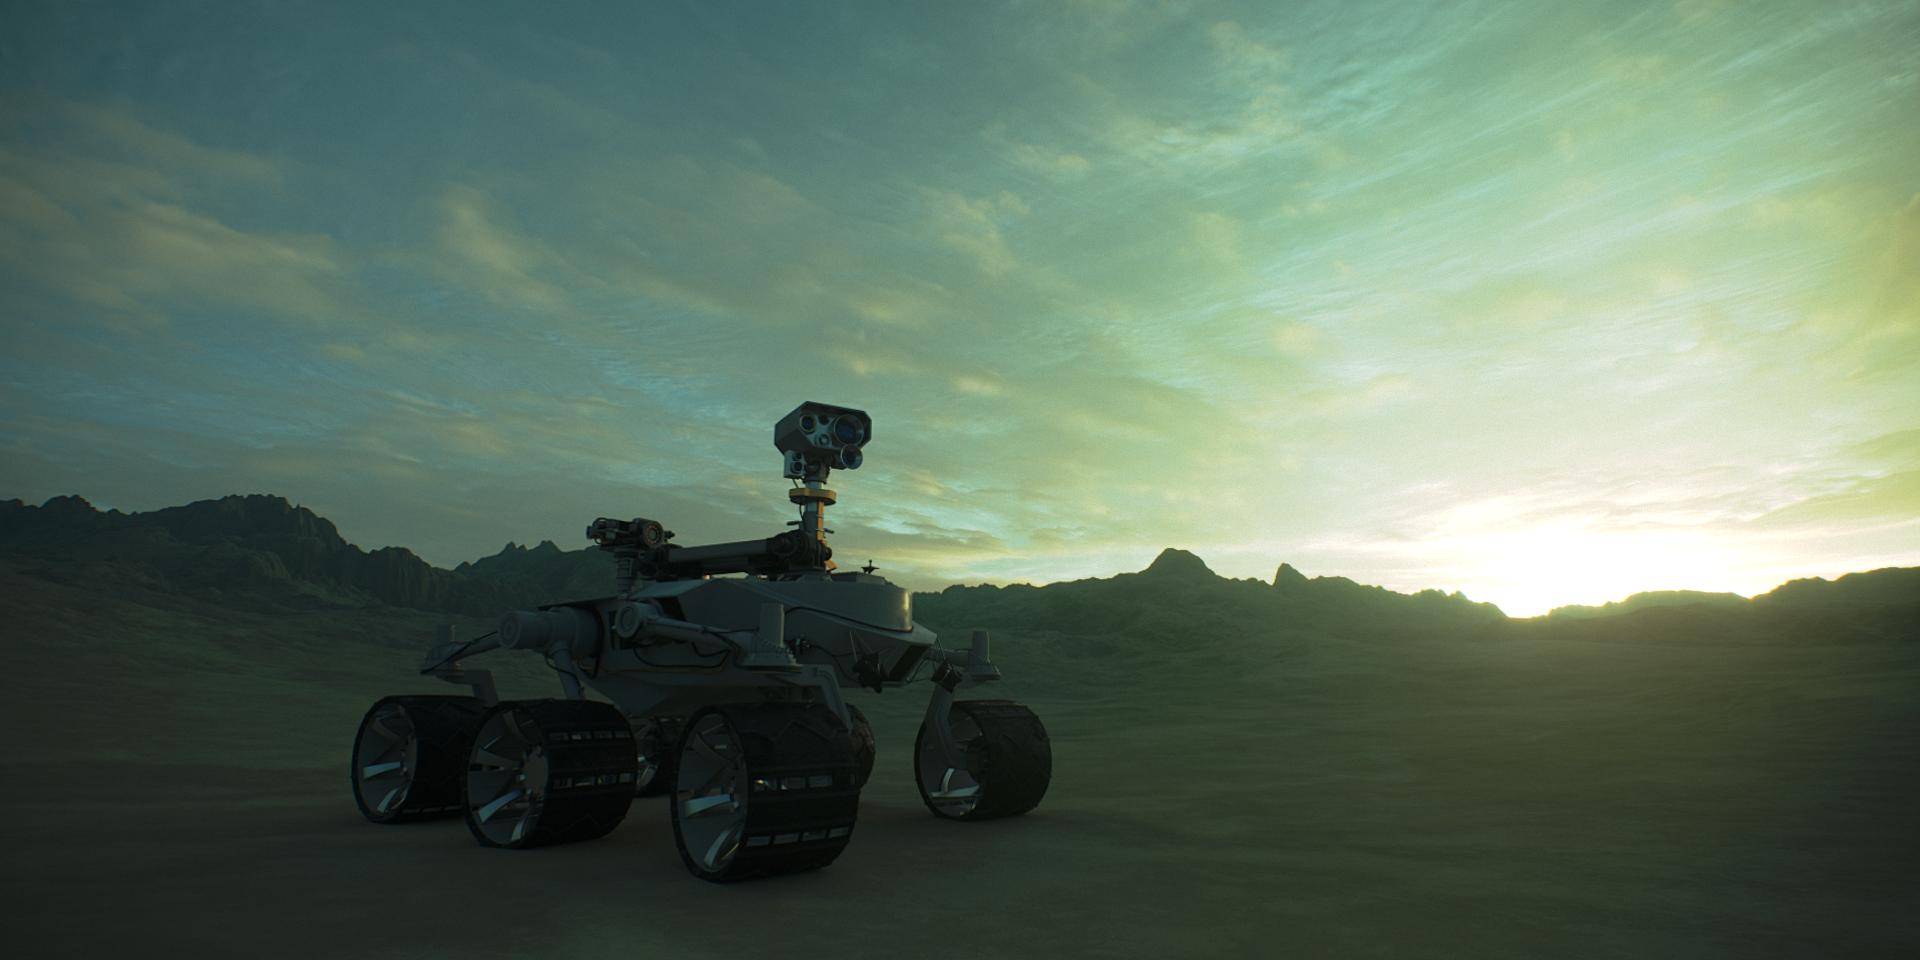 Rover Scene Alien Skies 08 Camera A.jpg